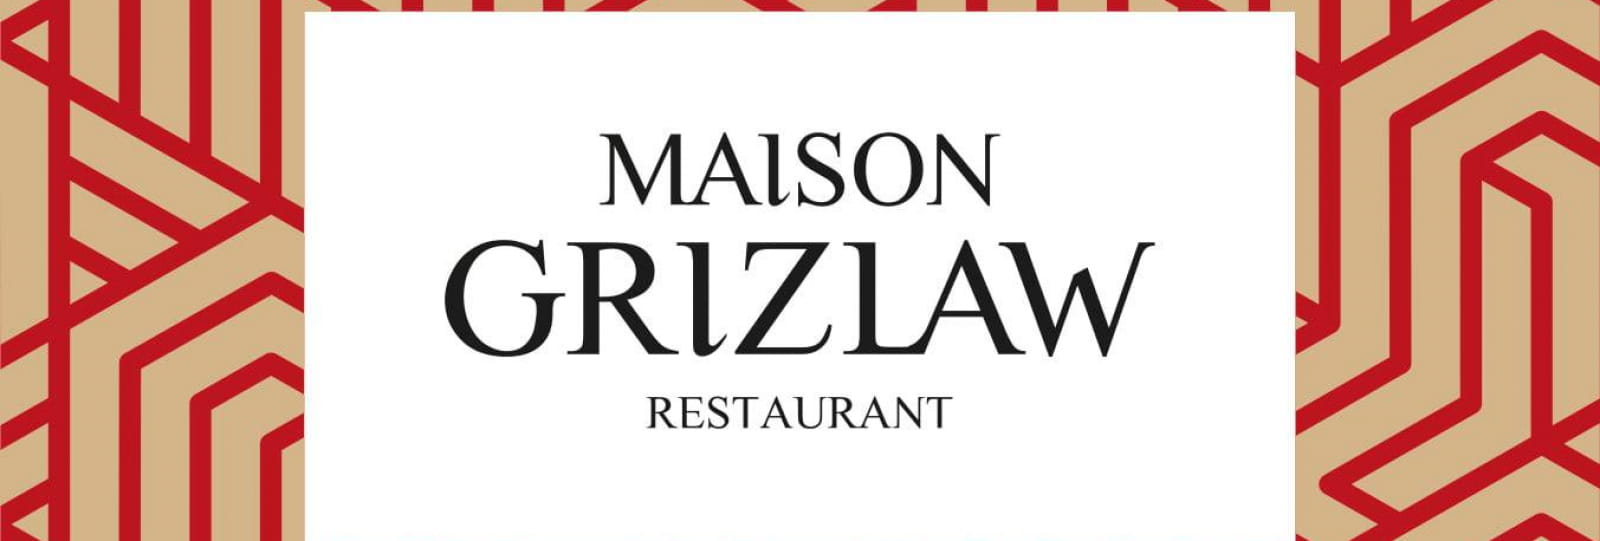 Maison Grizlaw